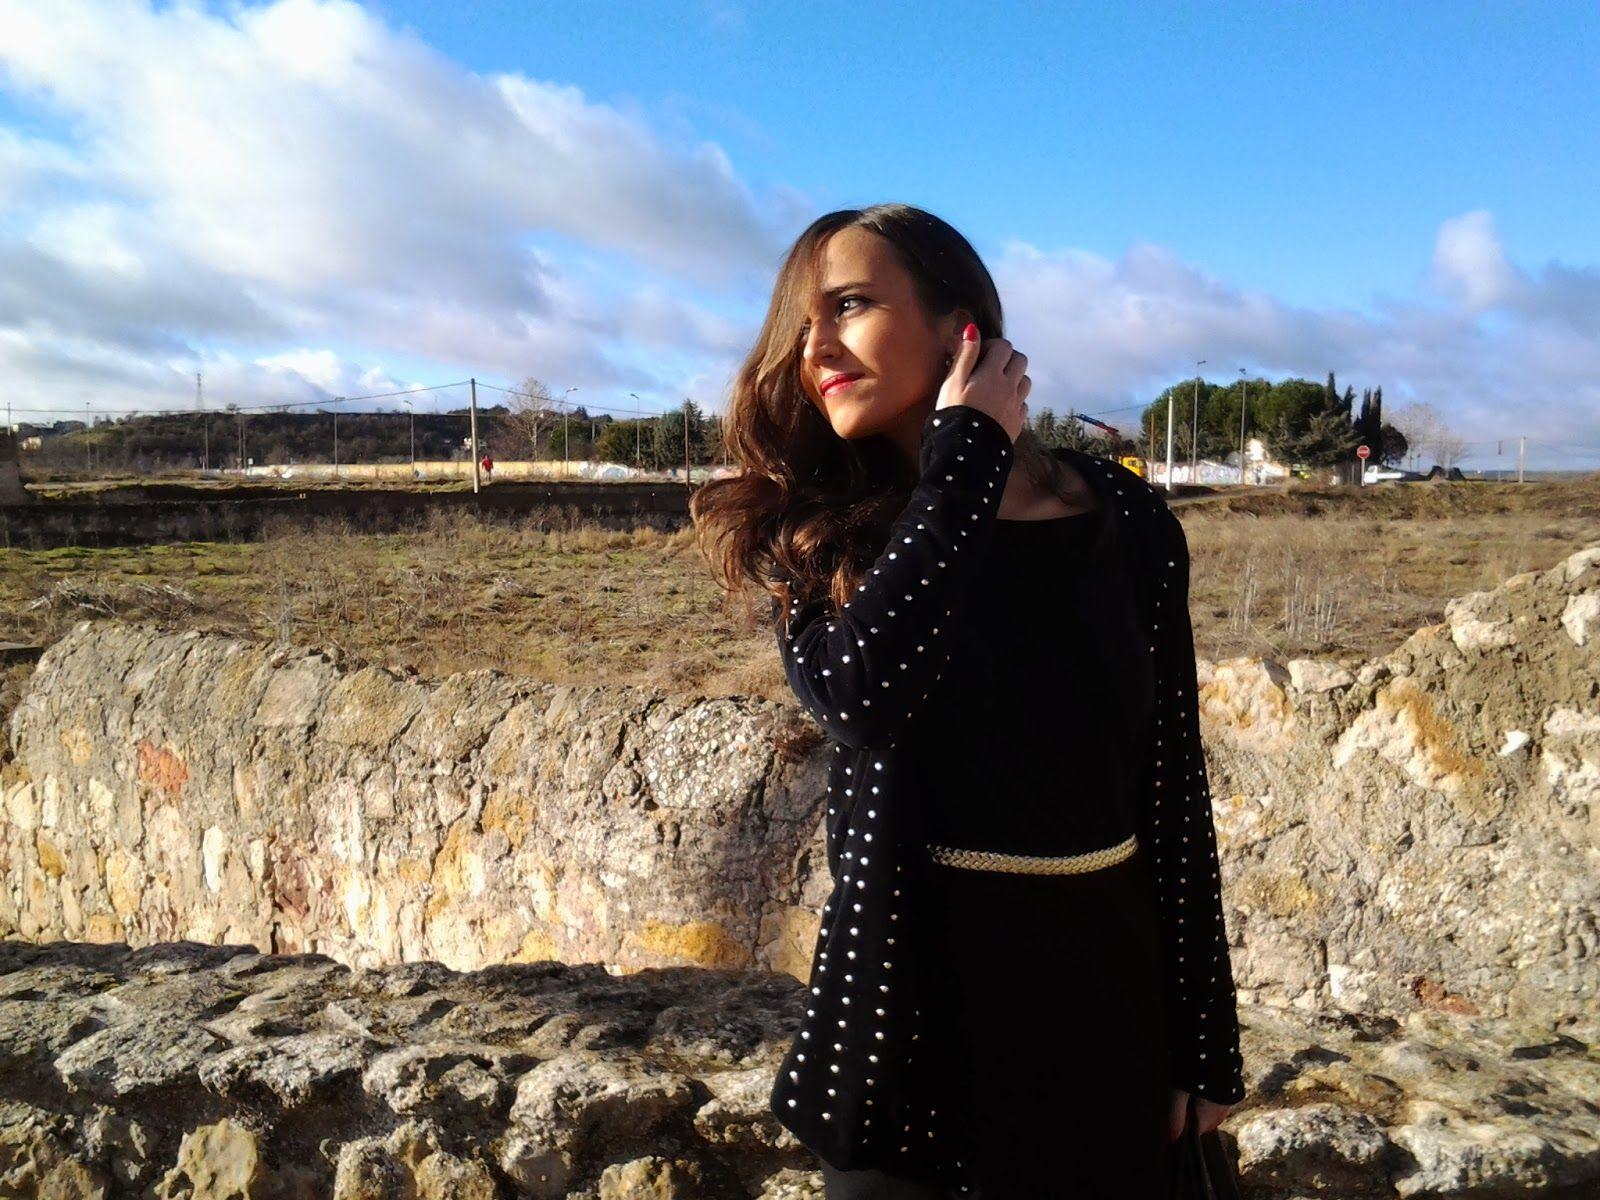 1000 maneras de vestir: Une robe noire